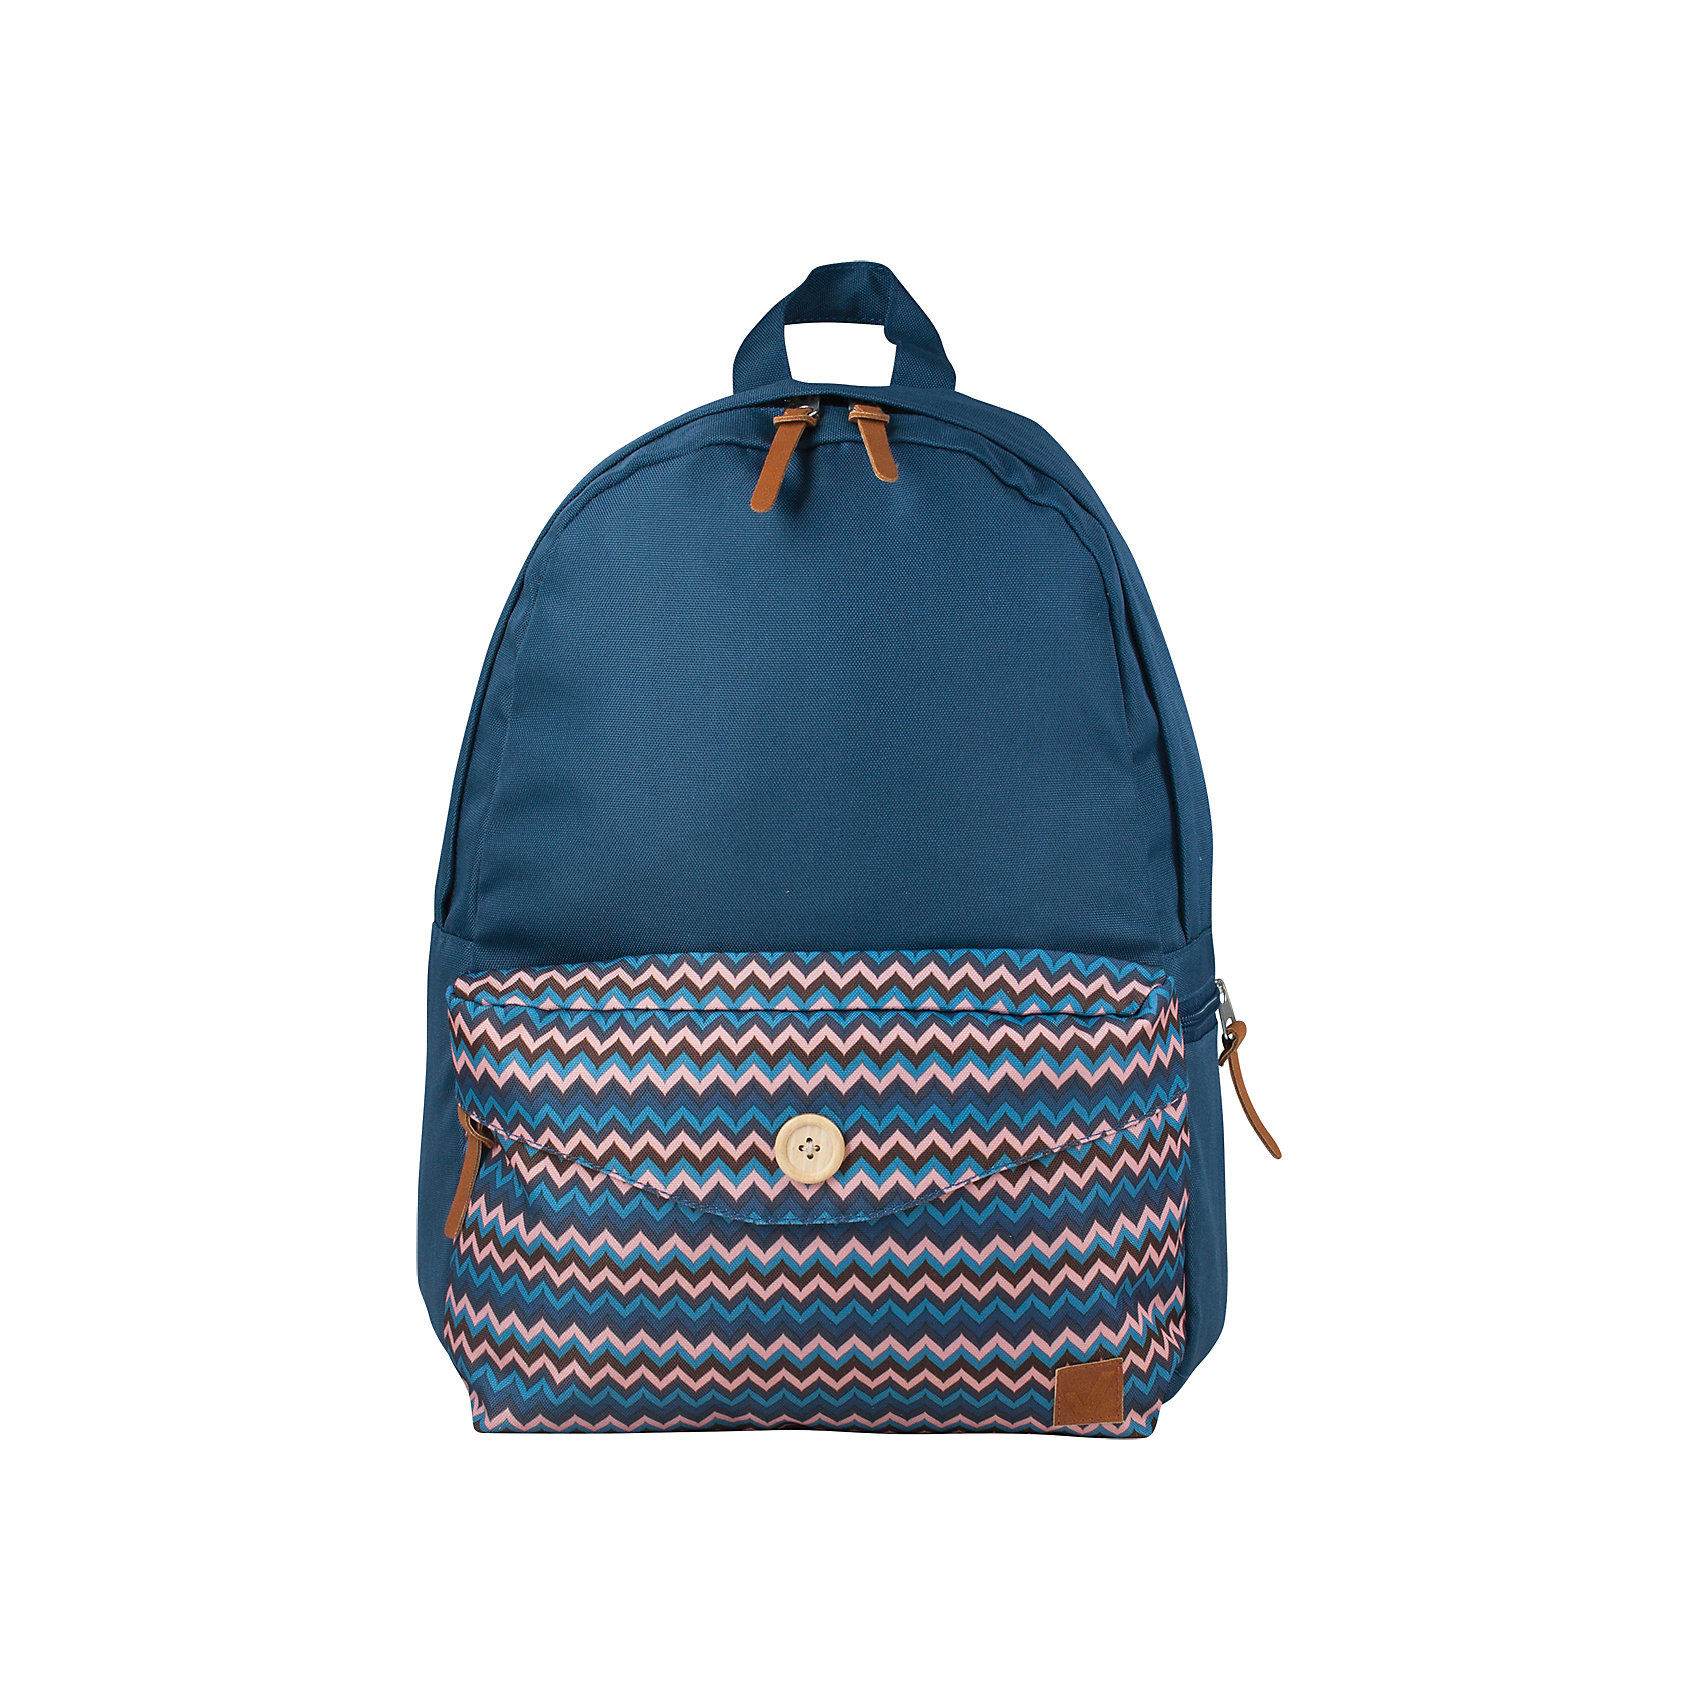 Рюкзак, карман с пуговицей